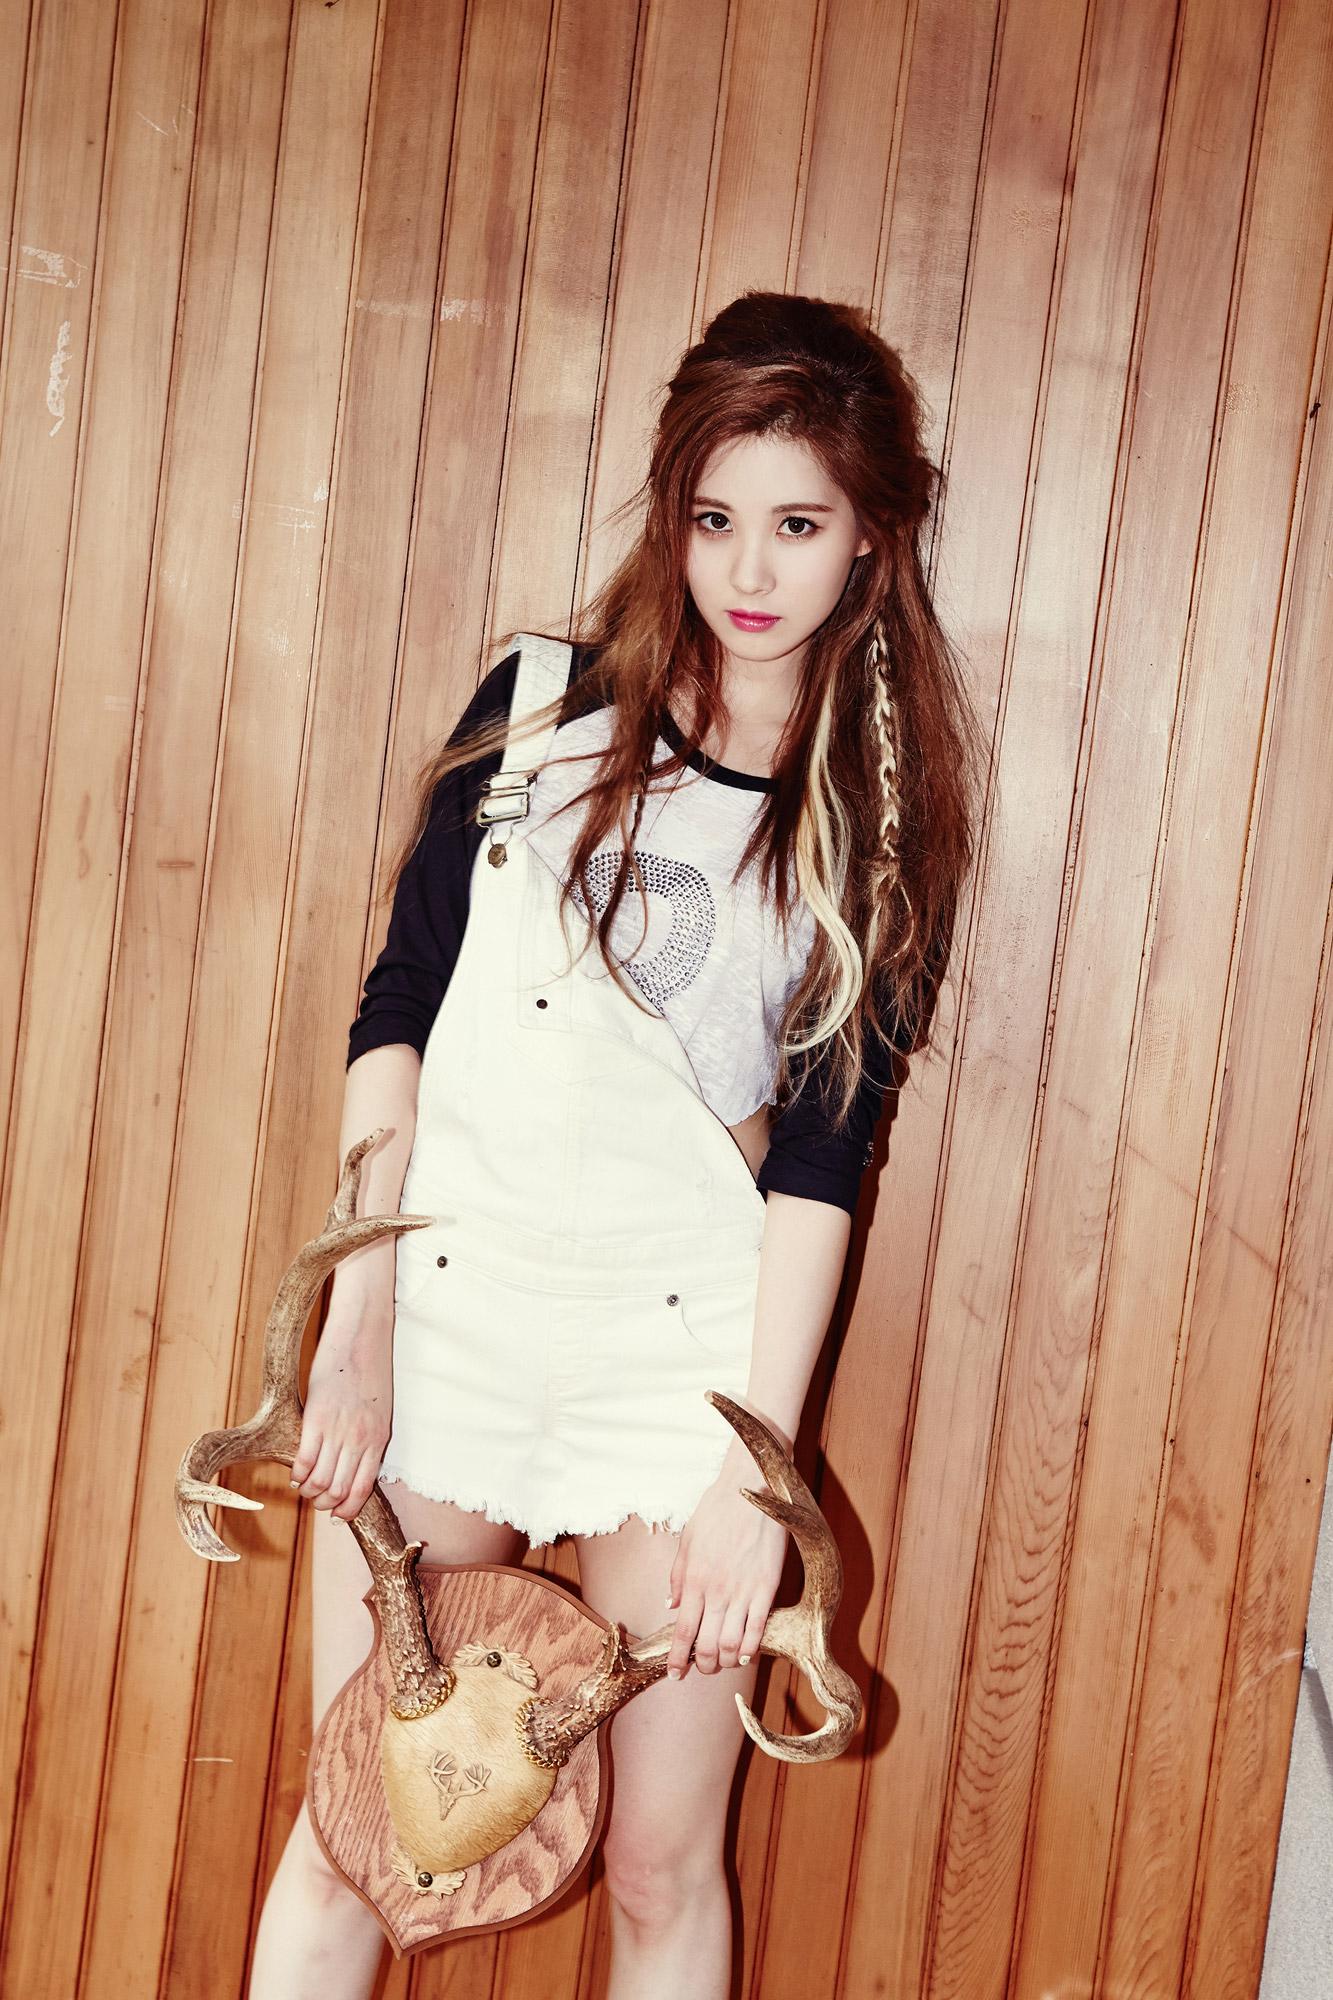 Girls GenerationSNSD images TaeTiSeo Seohyun Holler Image 1333x2000